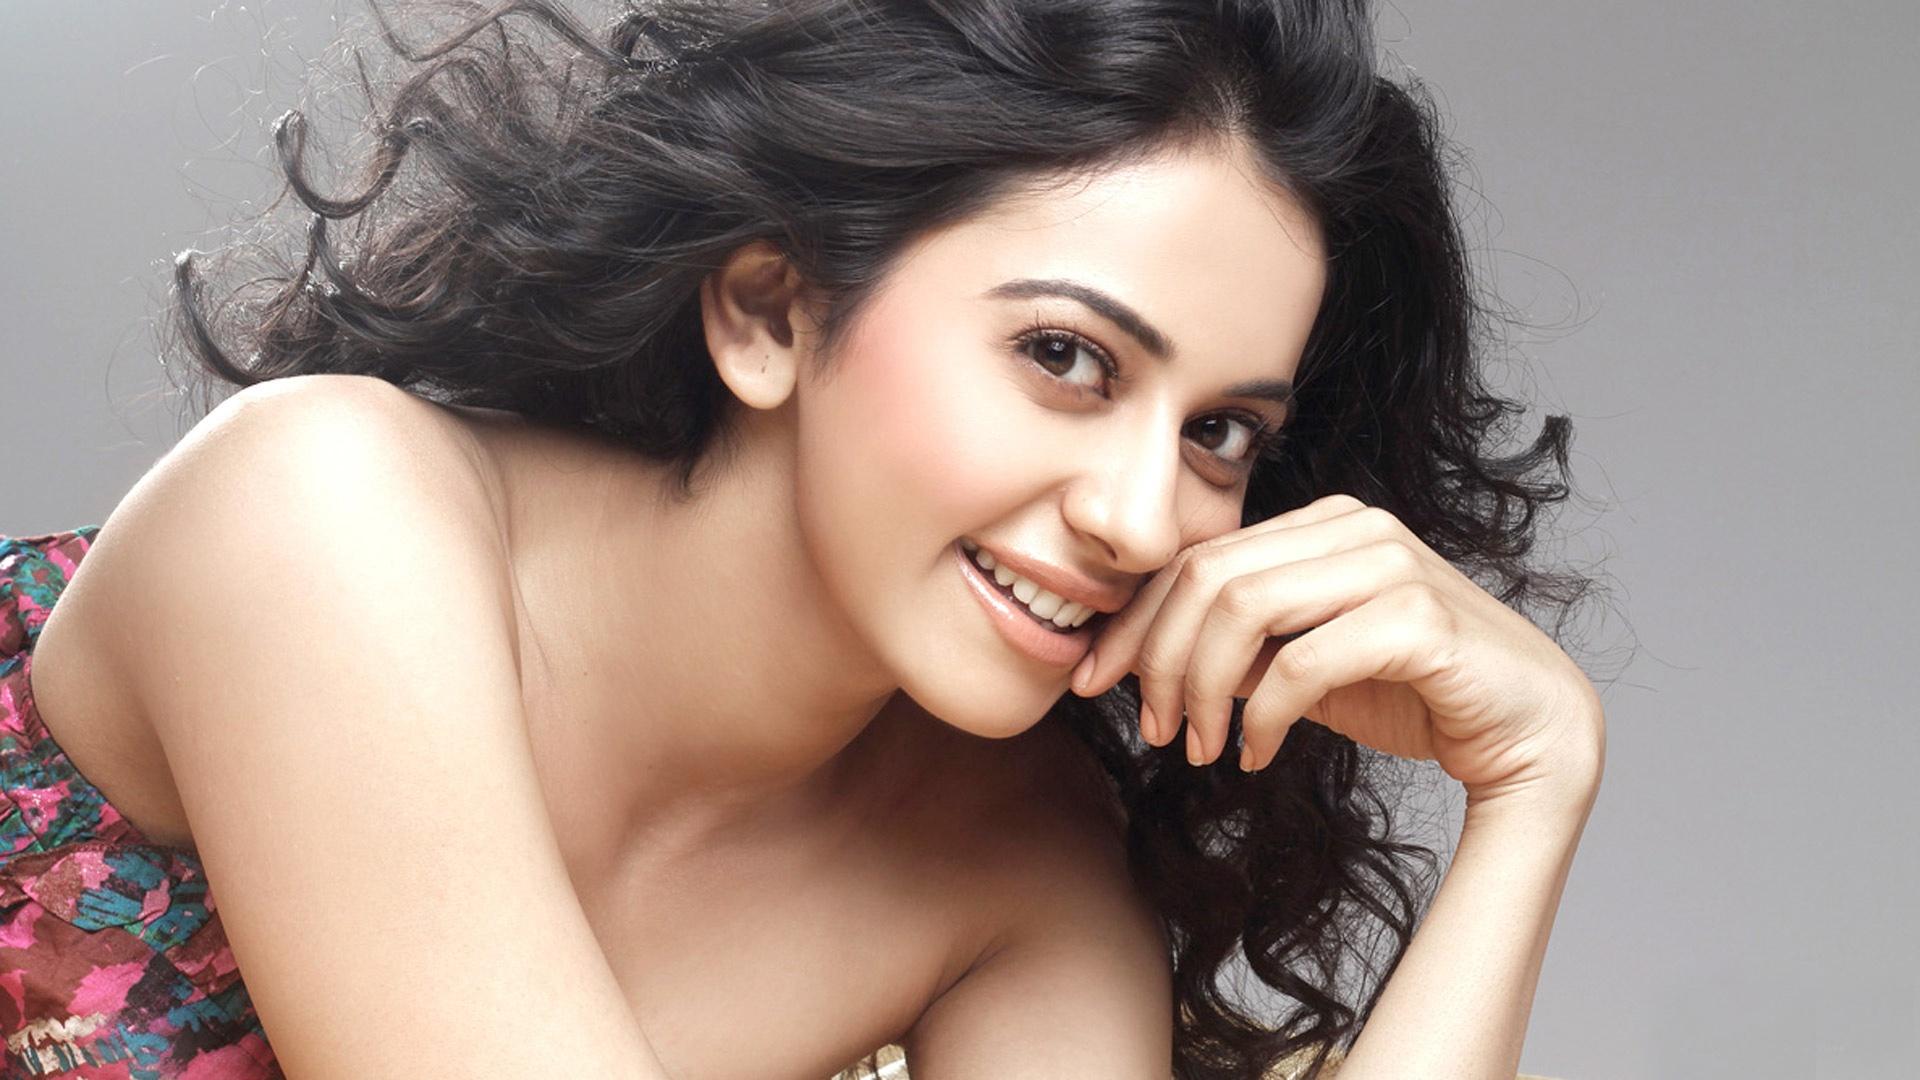 Rakul Preet Singh Telugu Actress Wallpapers In Jpg Format For Free